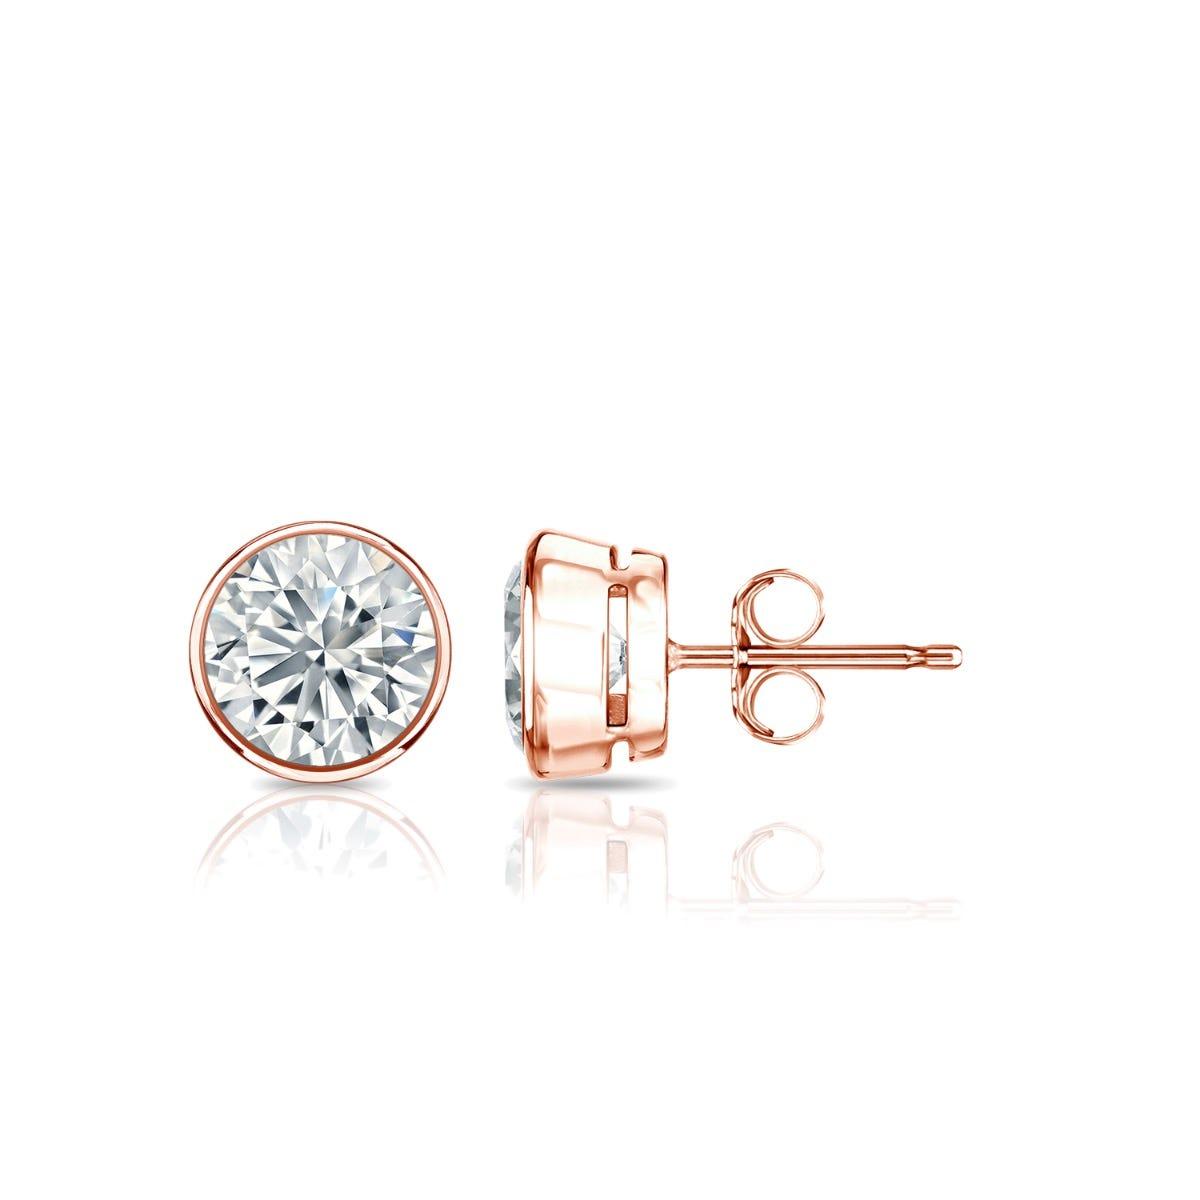 Diamond Round Bezel-Set 3/4ctw. Solitaire Stud (IJ-I2) Earrings in 10K Rose Gold